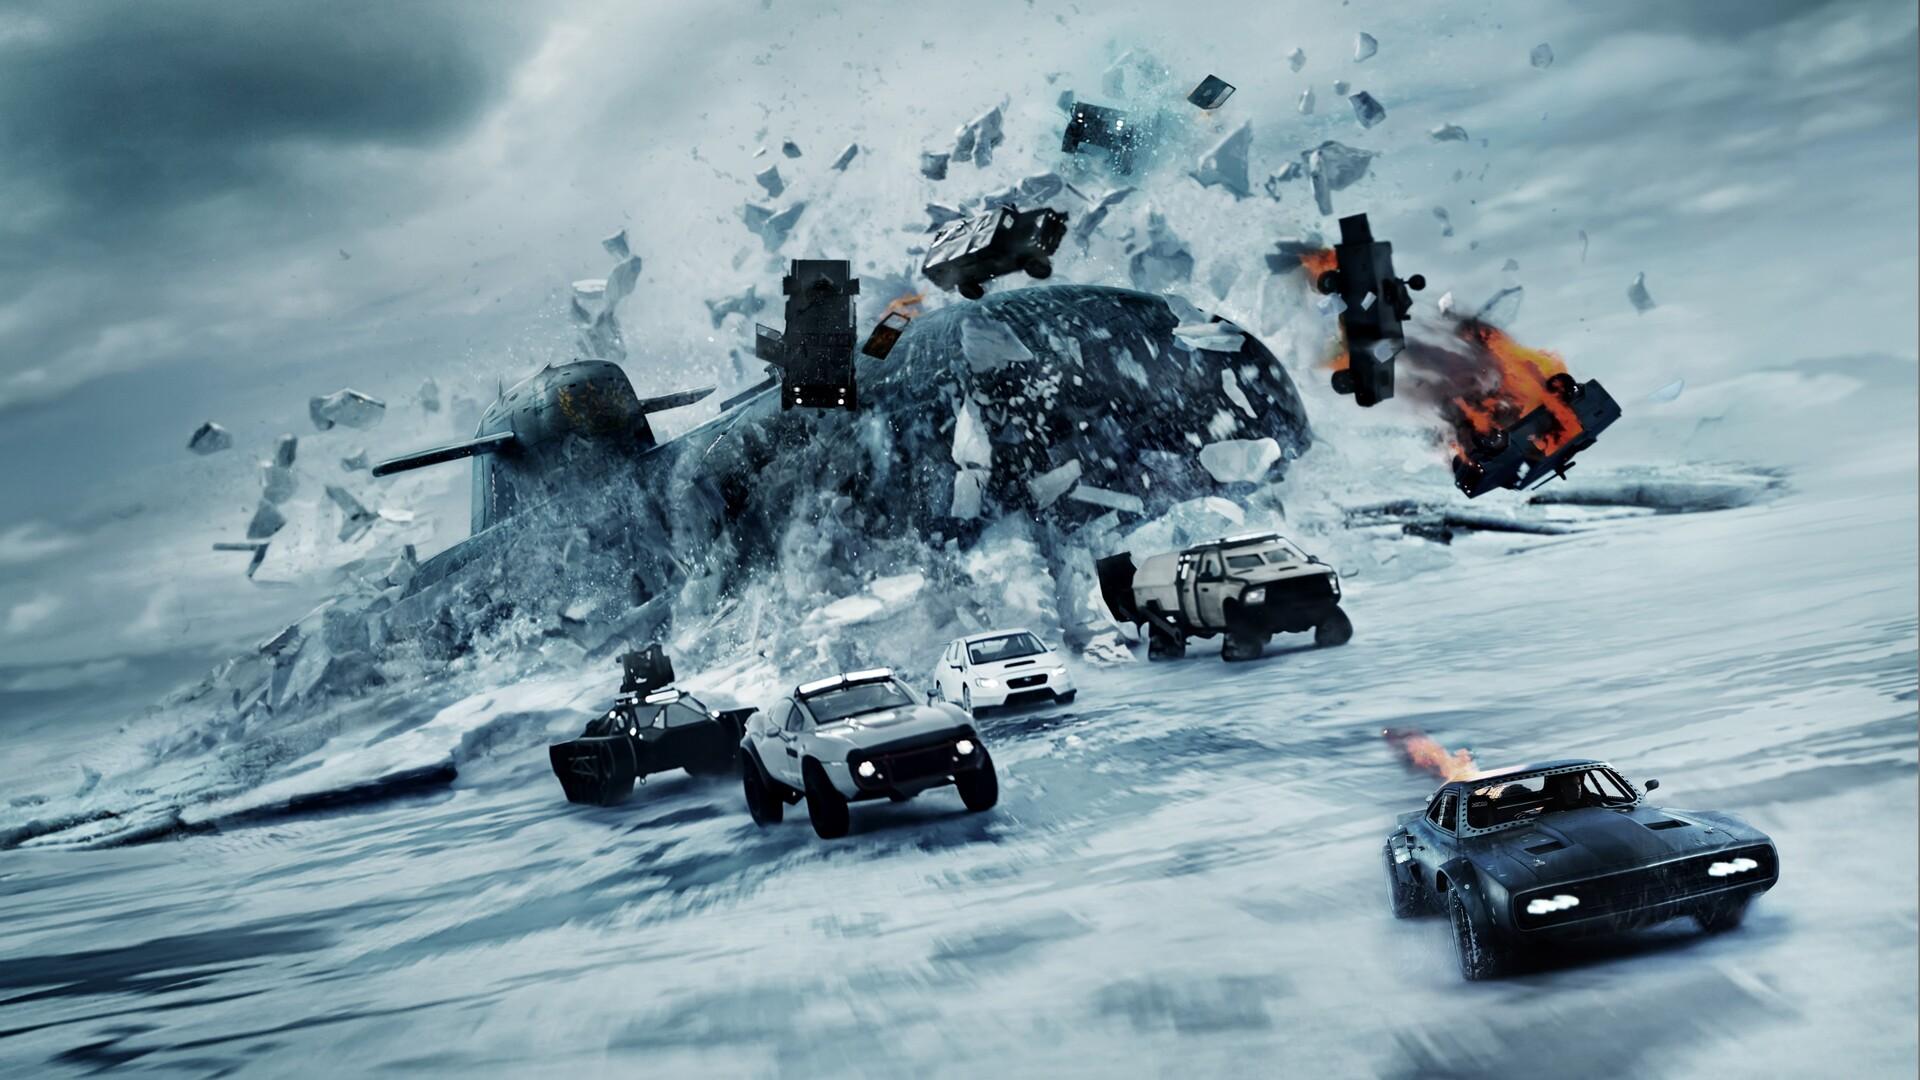 the-fate-of-the-furious-2017-movie-5k-qhd.jpg